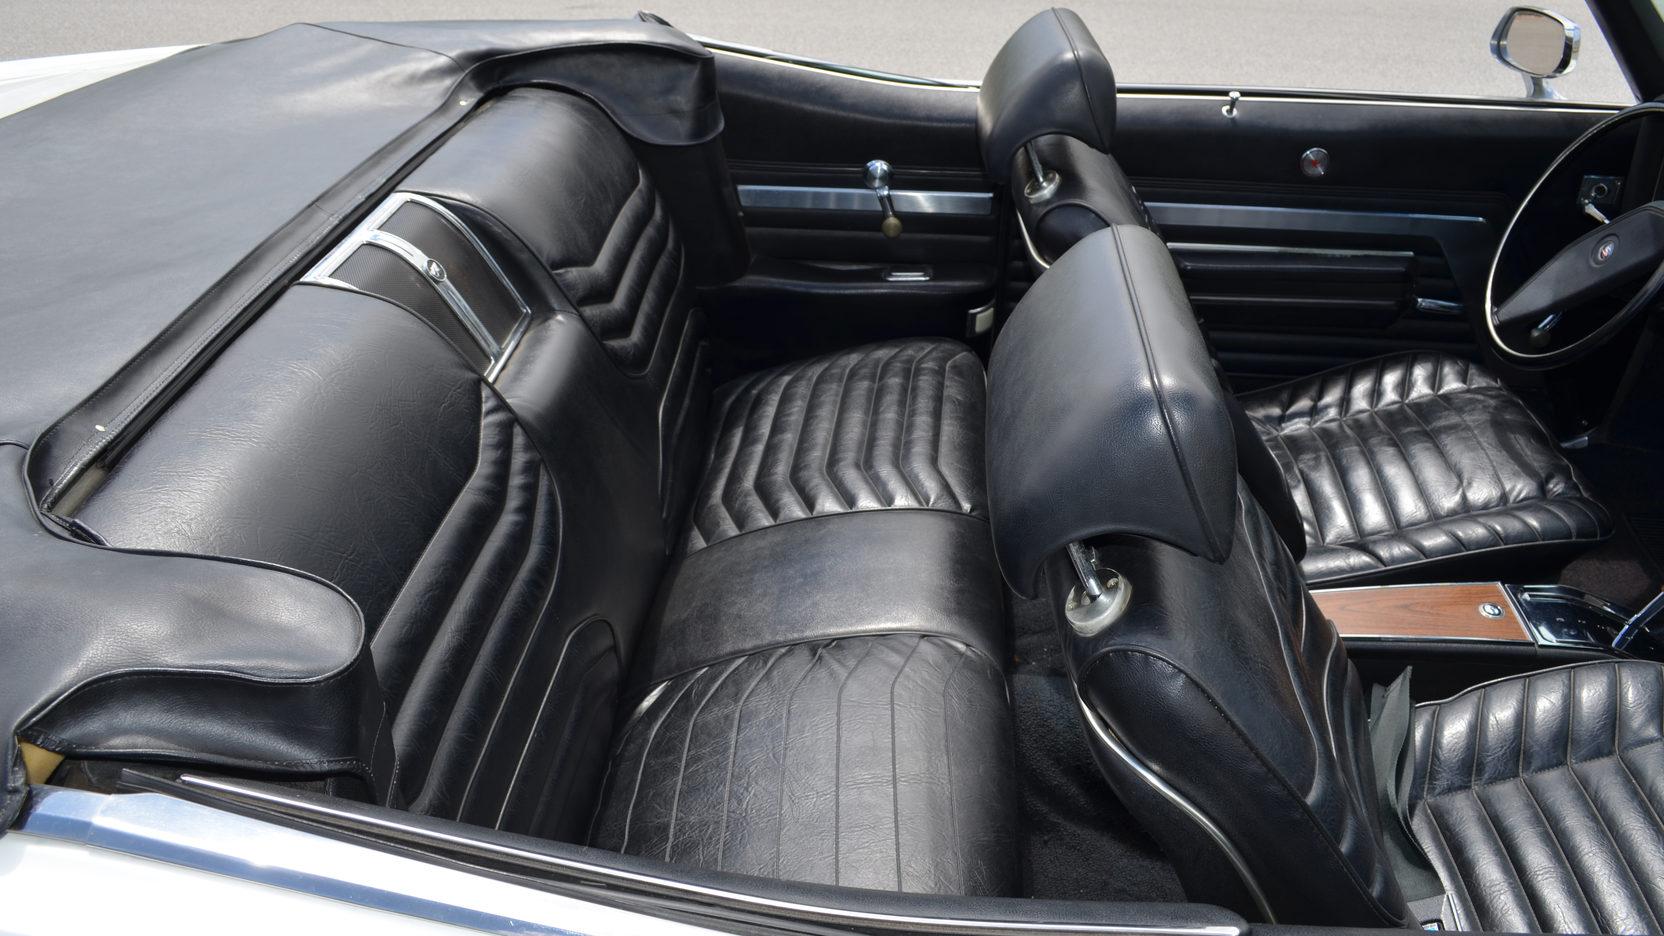 1970 Buick Wildcat interior rear seats